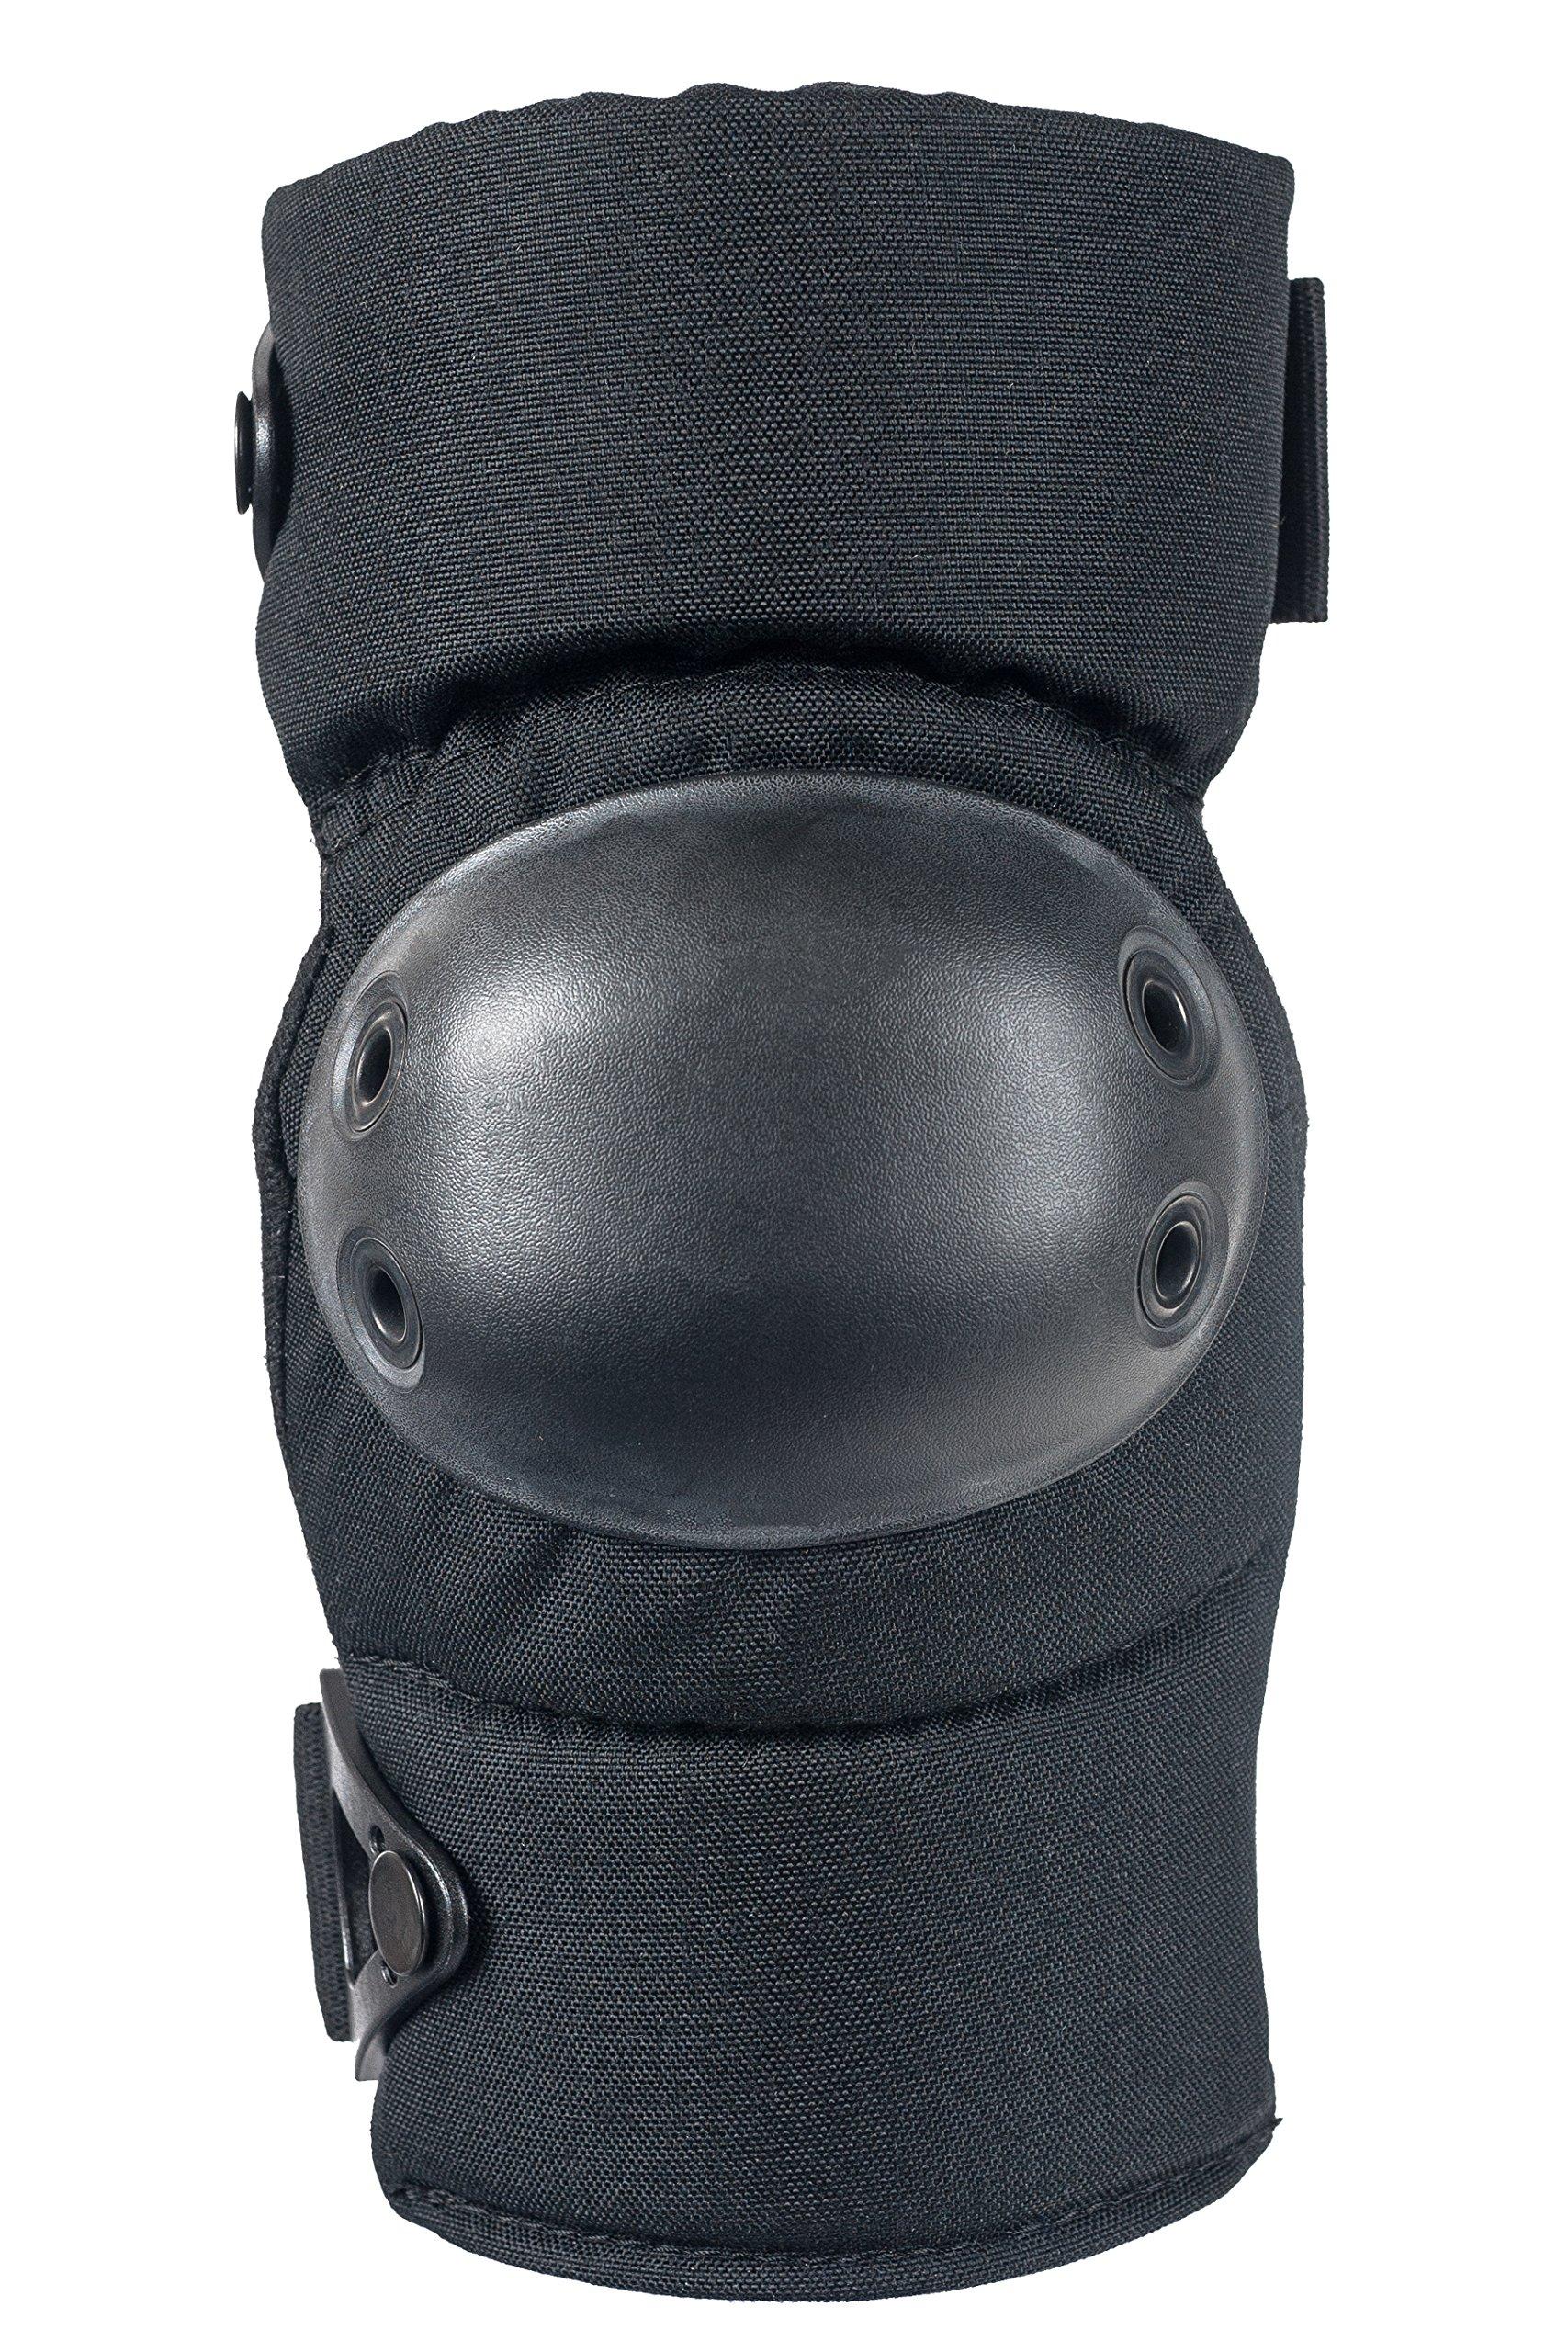 ALTA 53113.00 AltaCONTOUR Elbow Protector Pad, Black Cordura Nylon Fabric, AltaLOK Fastening, Flexible Cap, Round, Black by Alta